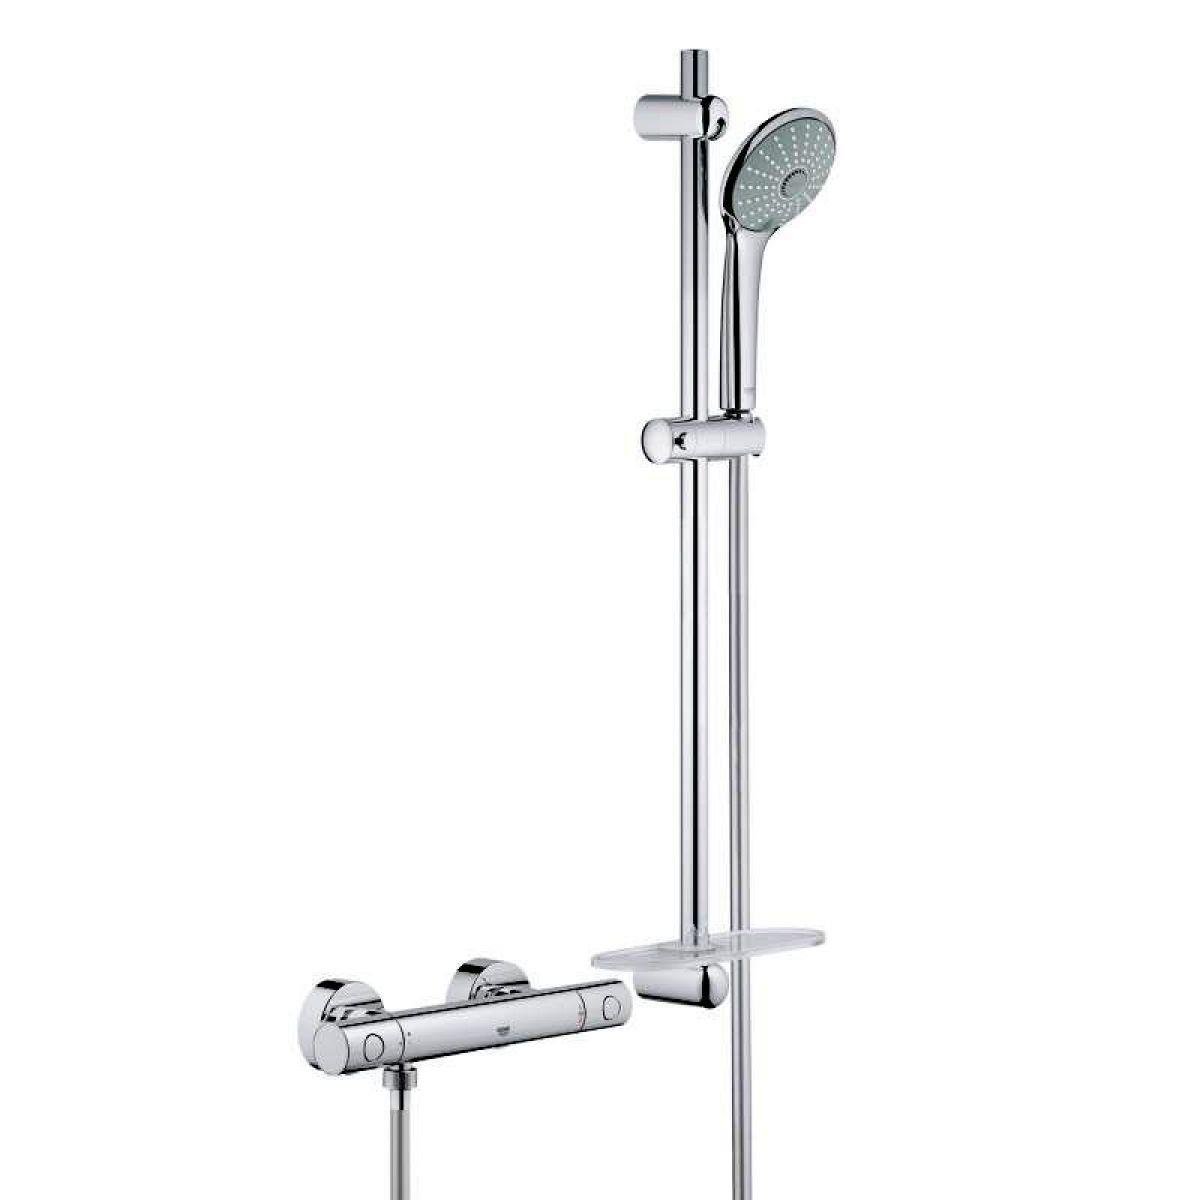 Unik Grohtherm 1000 Cosmopolitan M Thermostatic shower mixer : UK Bathrooms JF38